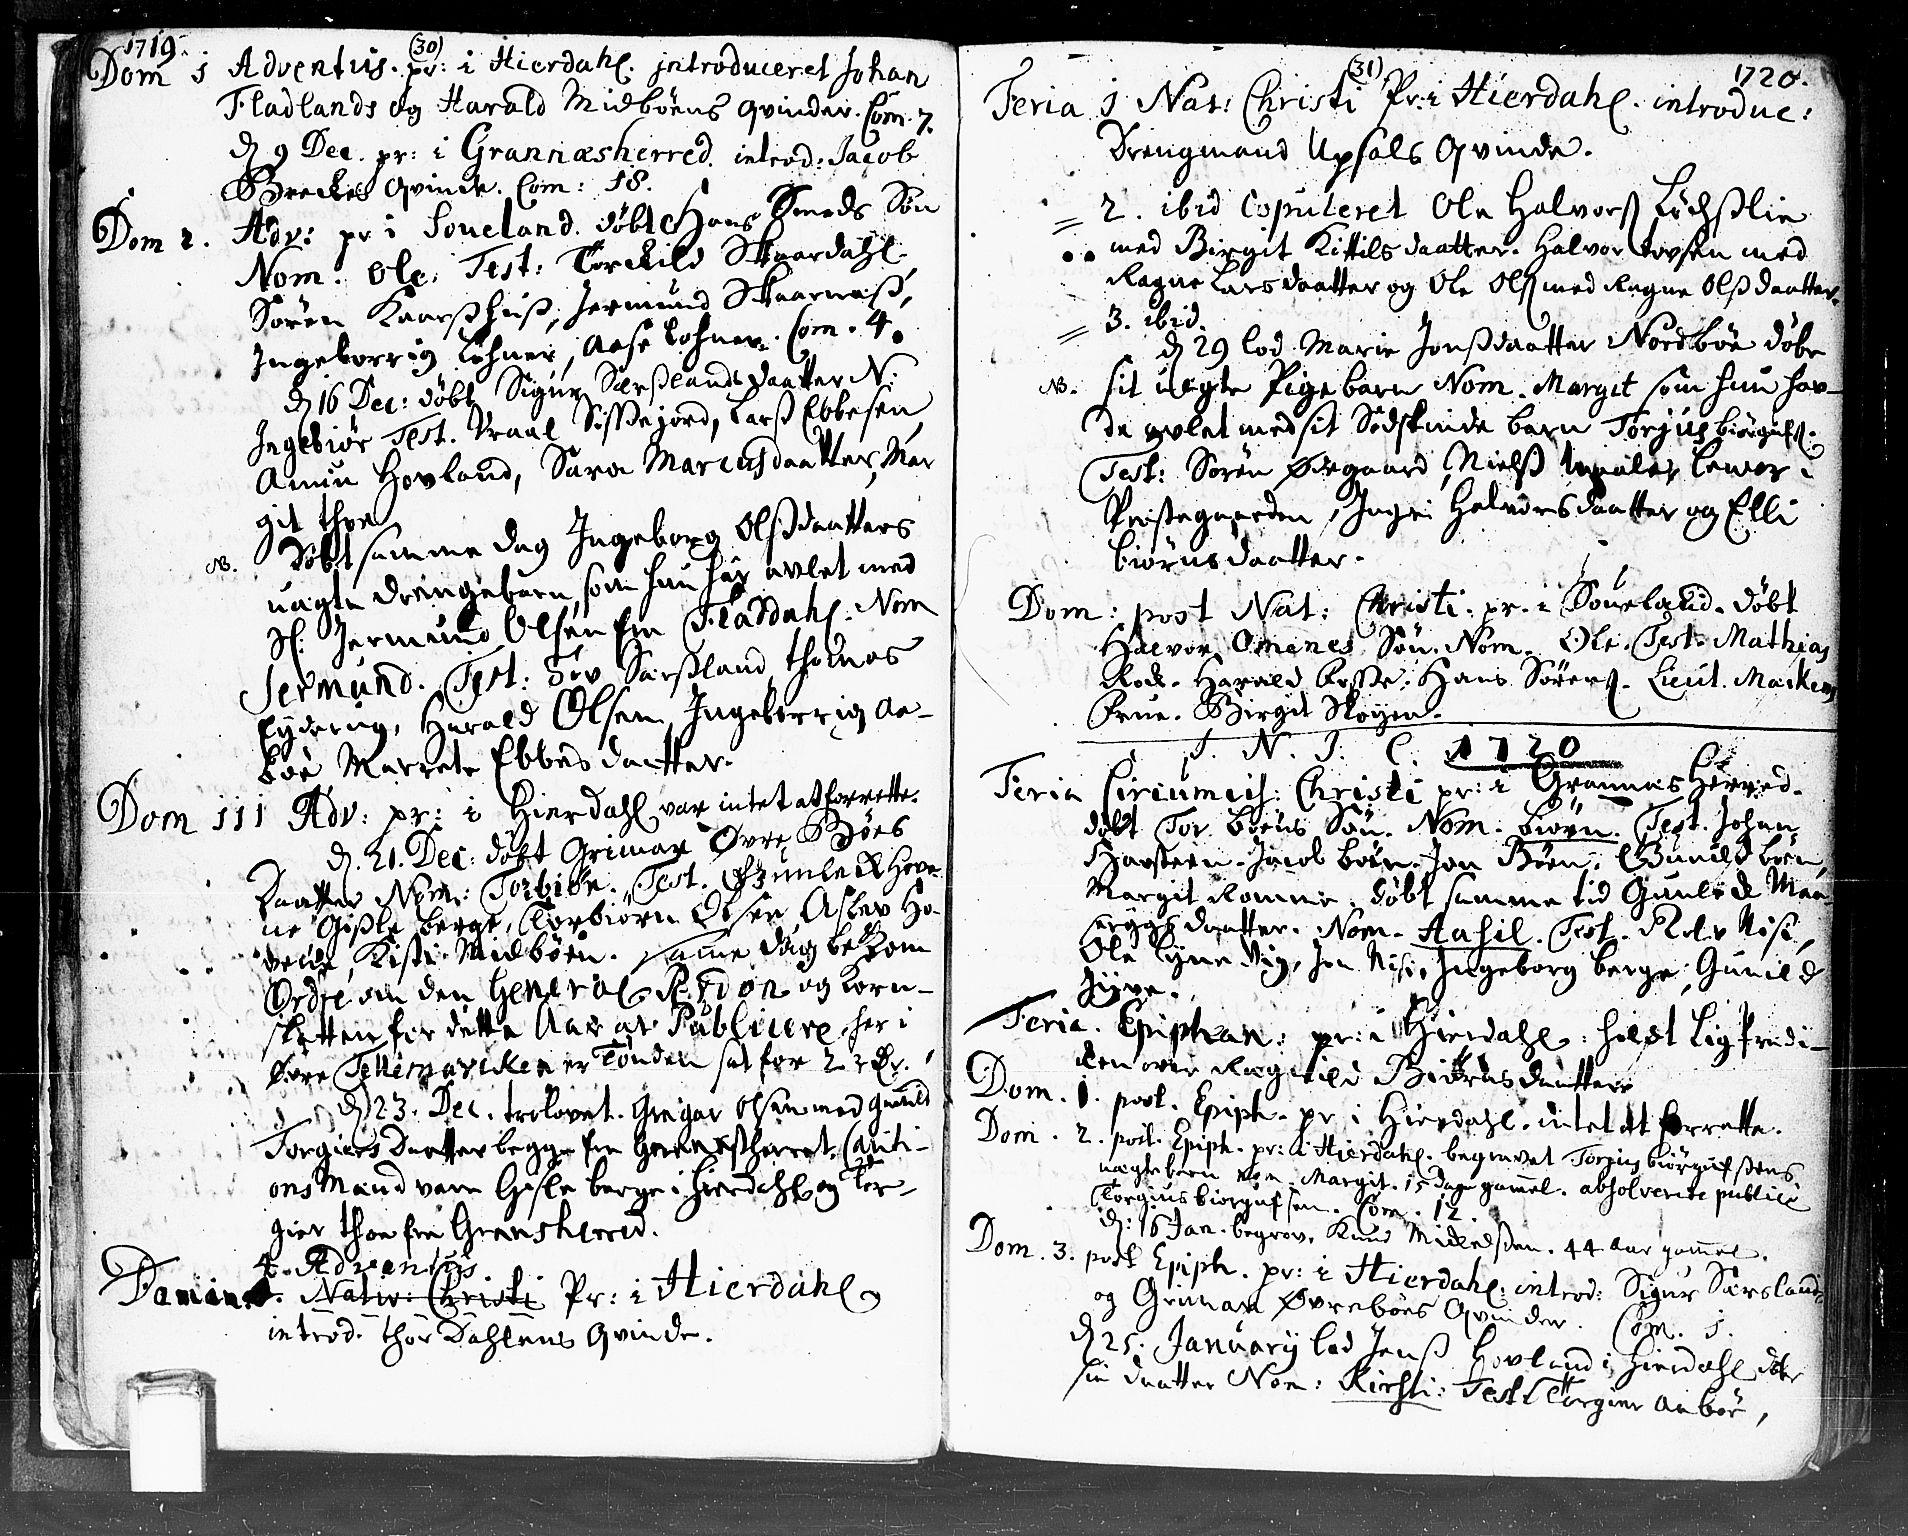 SAKO, Hjartdal kirkebøker, F/Fa/L0002: Ministerialbok nr. I 2, 1716-1754, s. 30-31